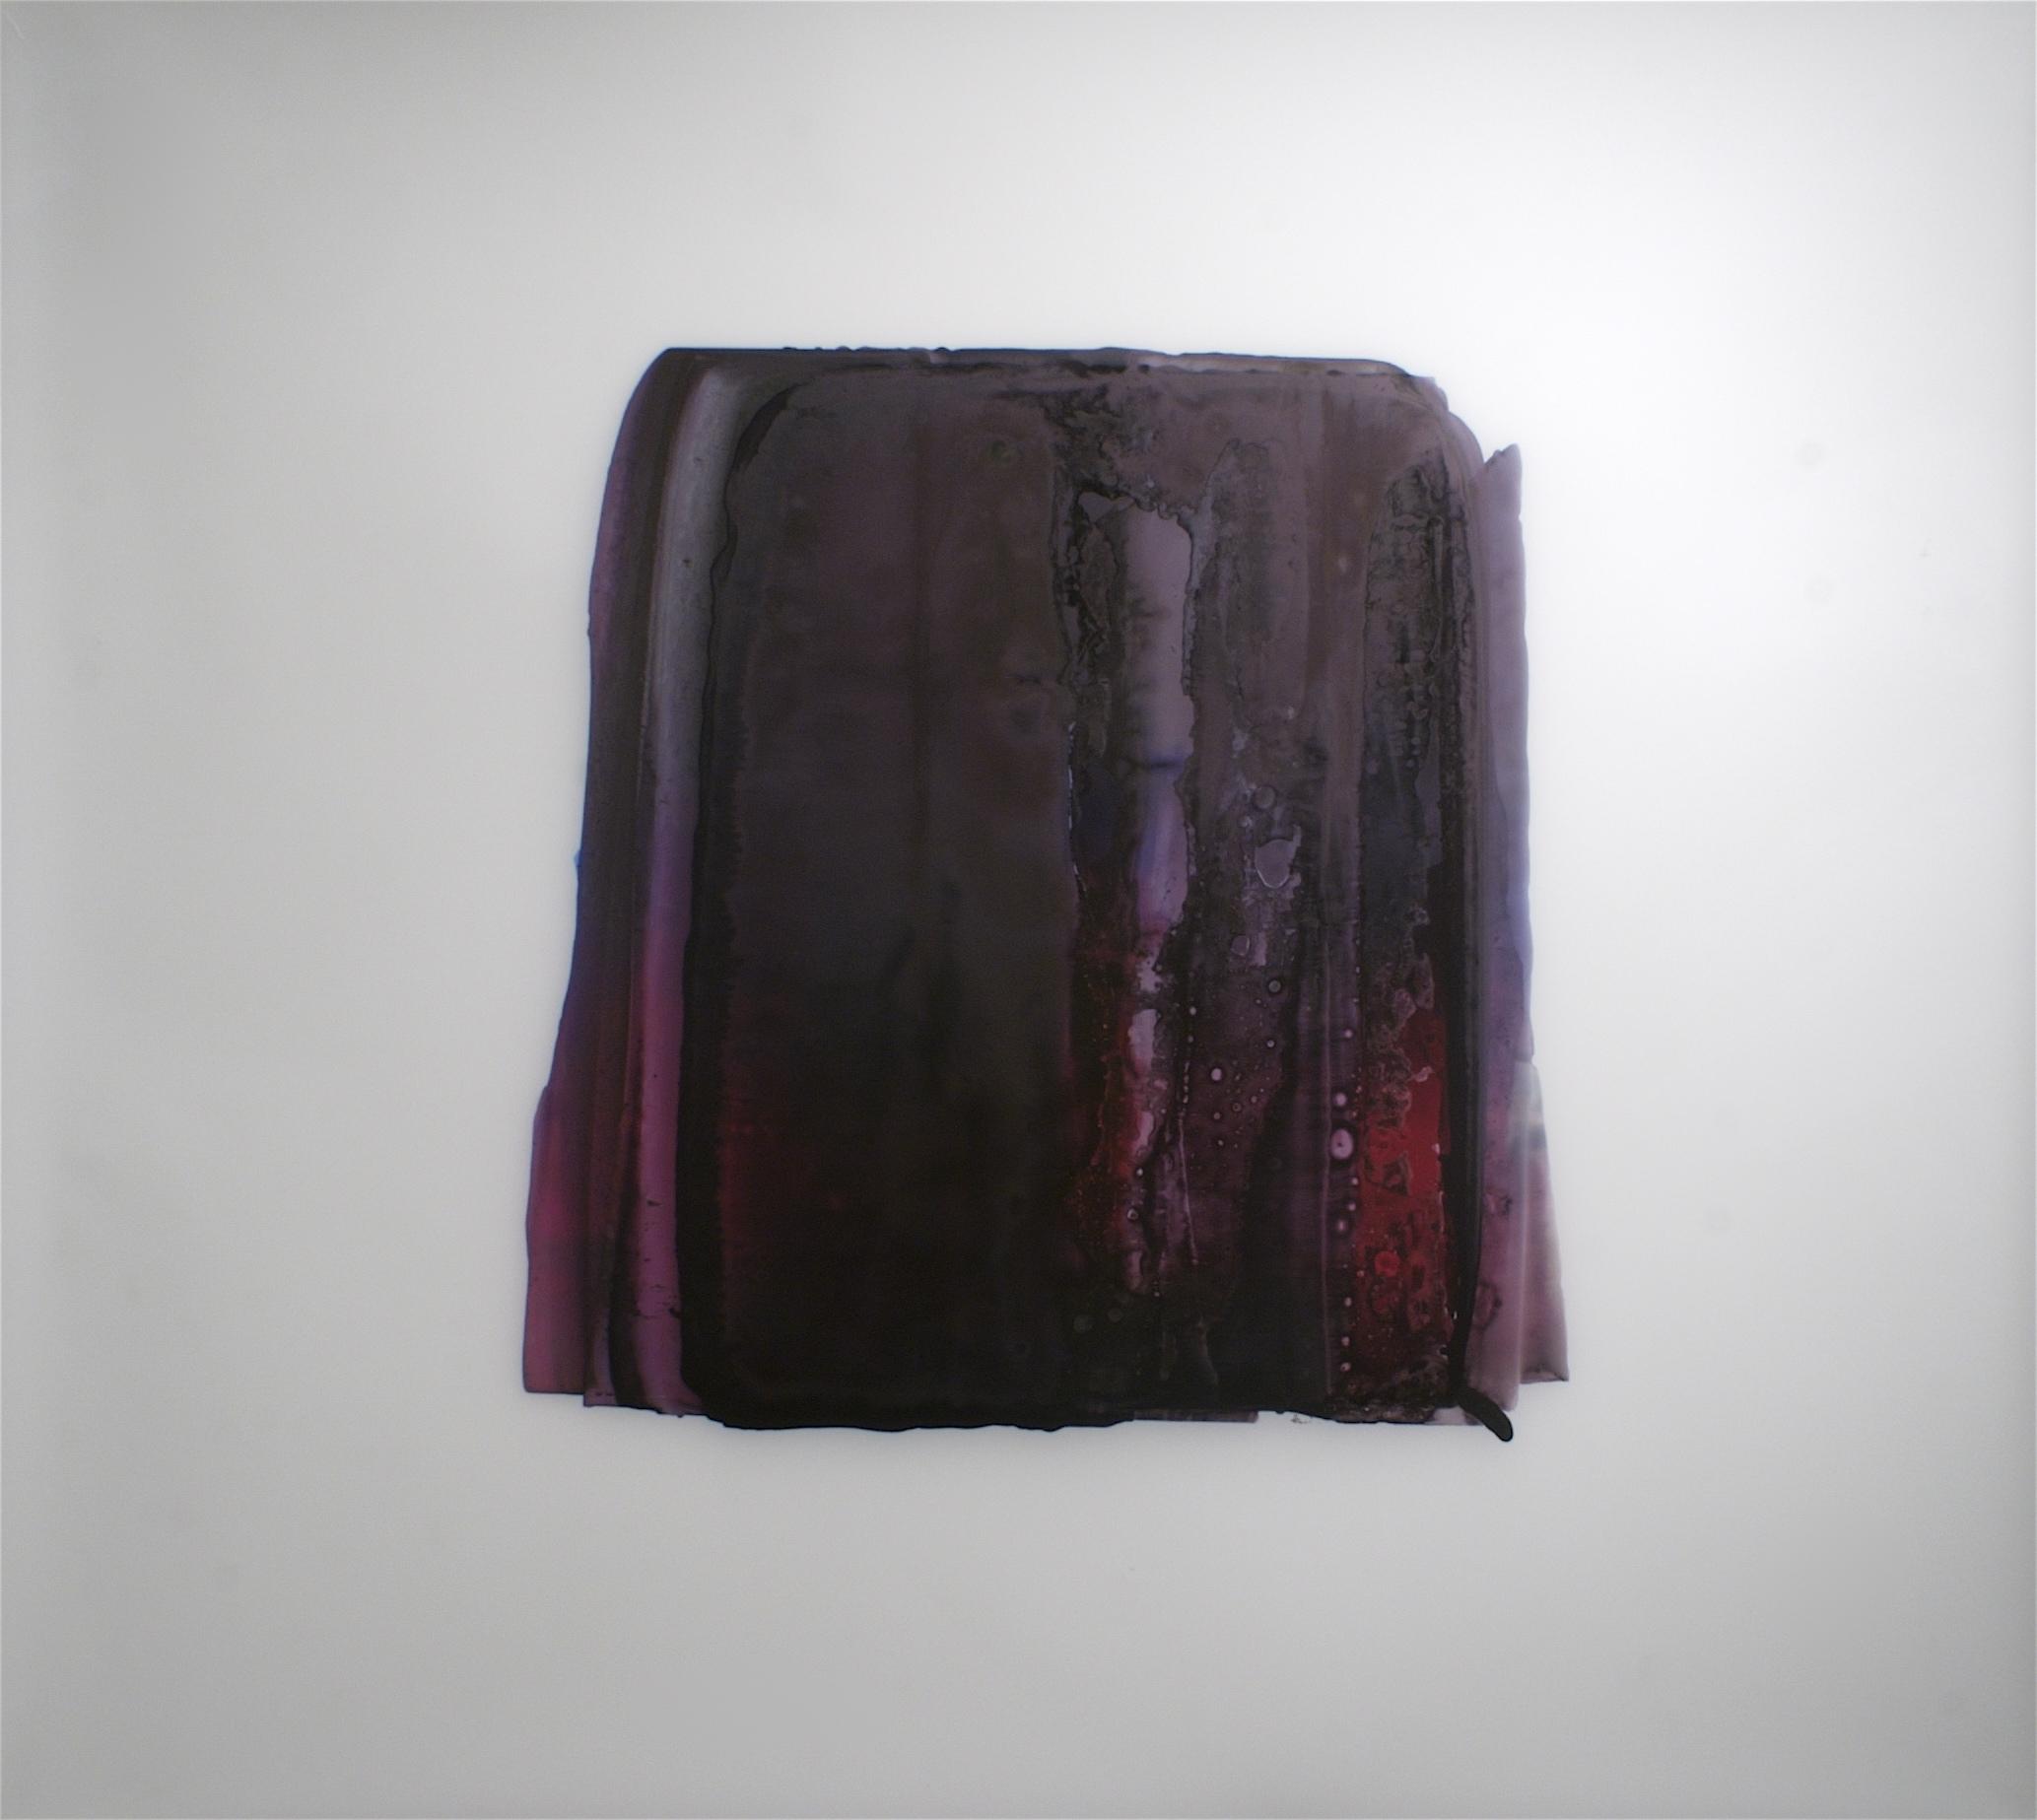 Untitled (square) 69435.jpg